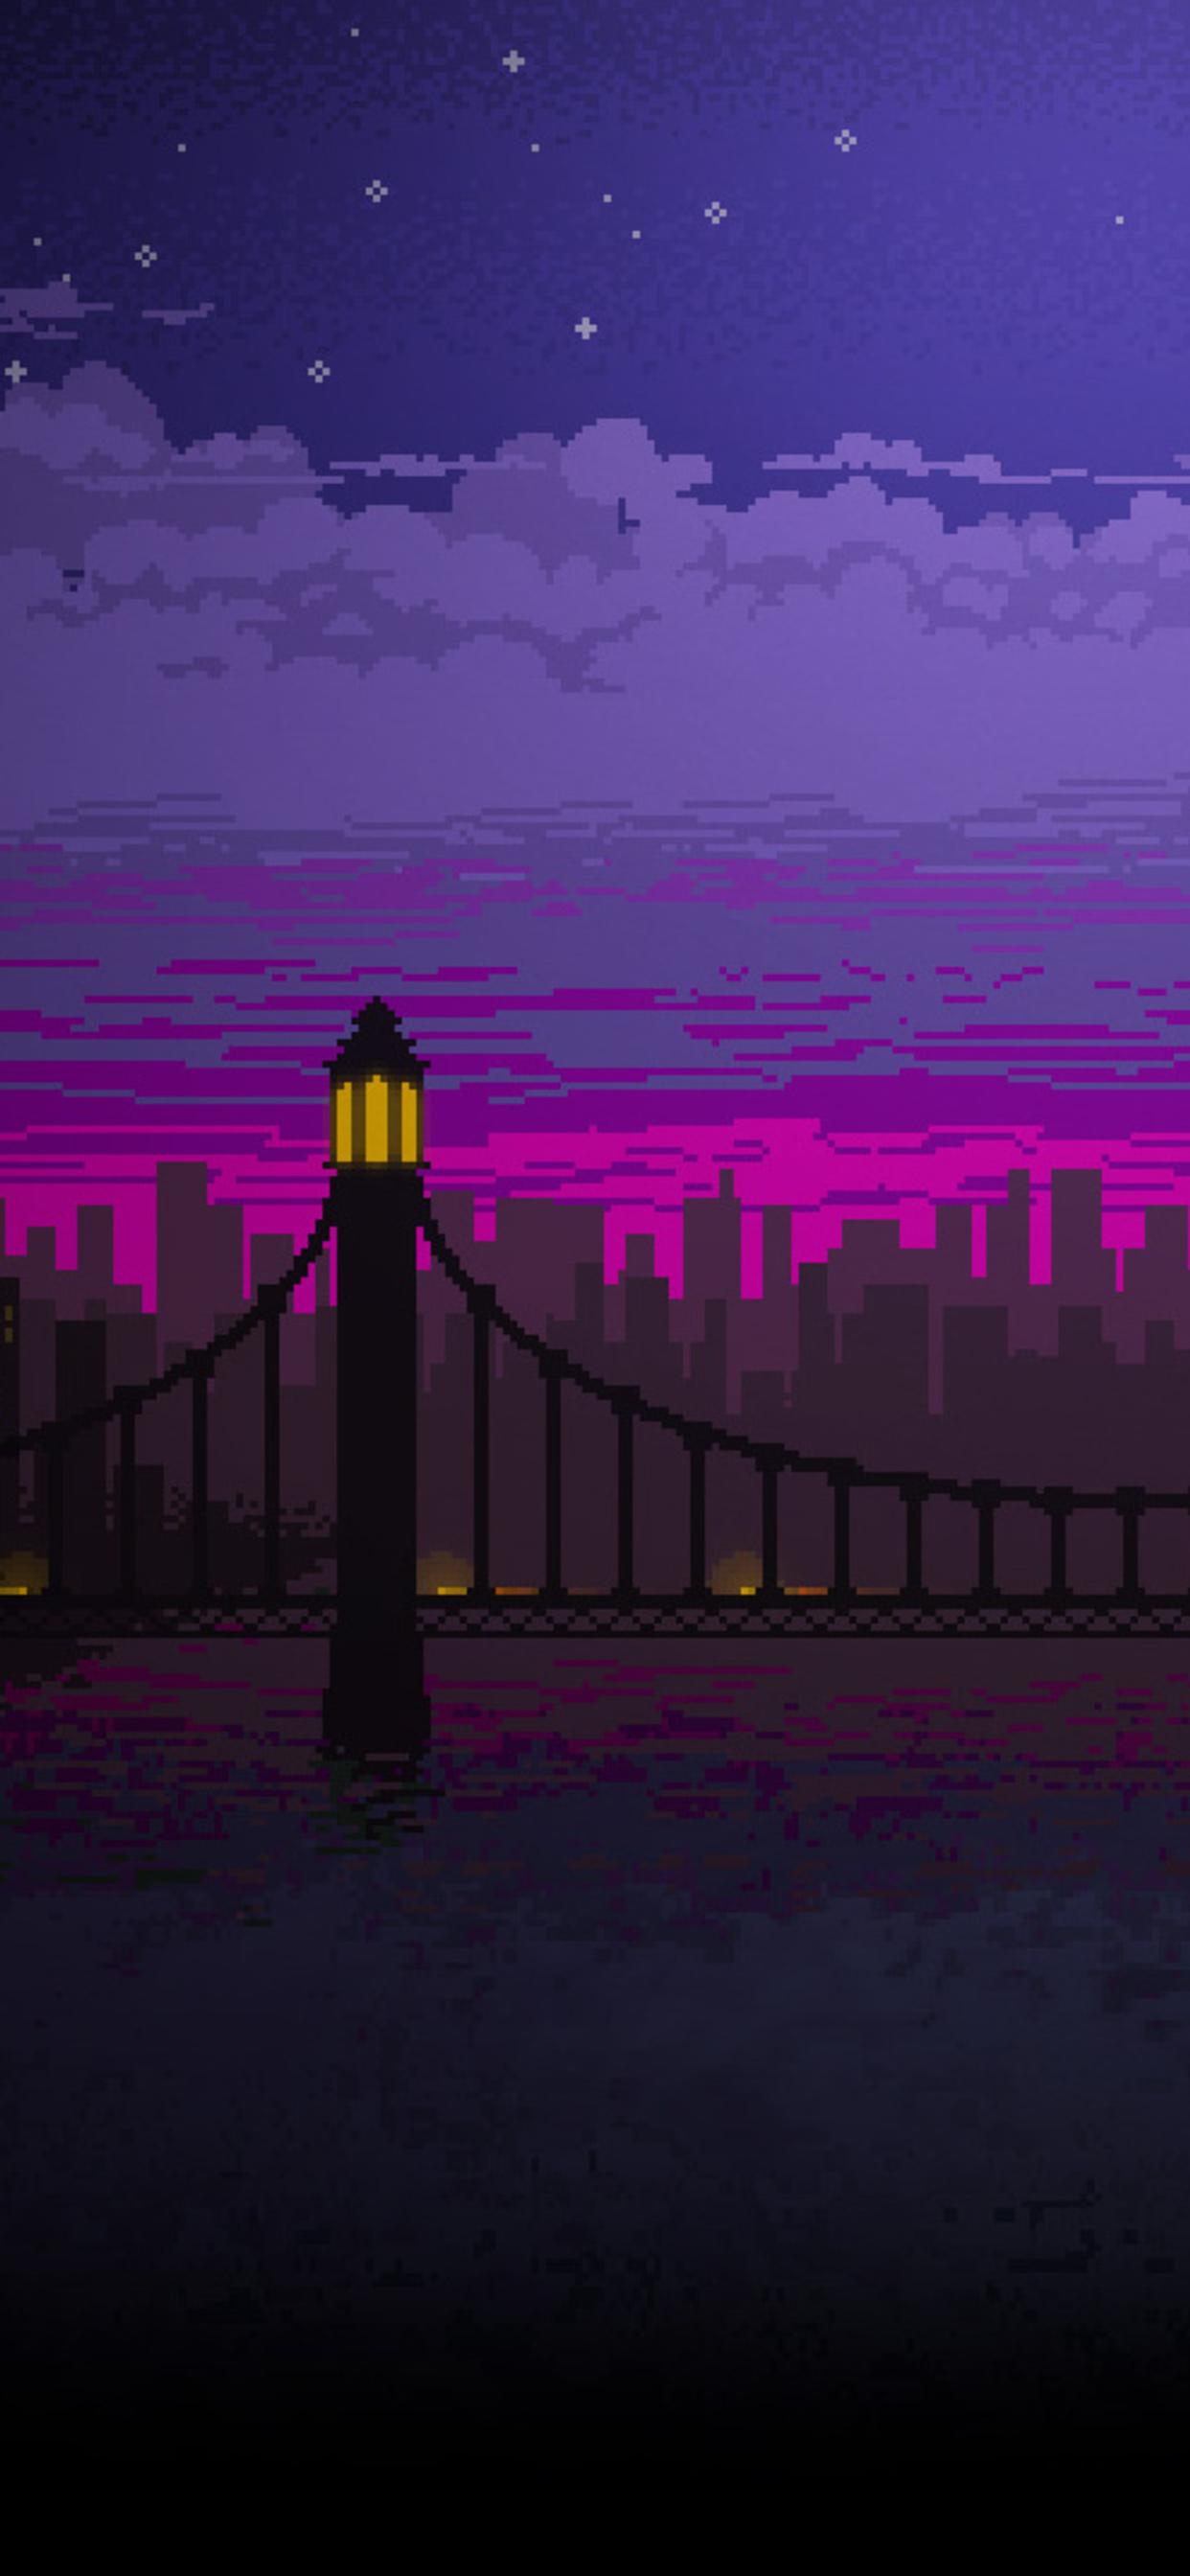 Wallpaper Keren 3d Hd Android 1242x2688 Pixel Art Bridge Night Iphone Xs Max Hd 4k